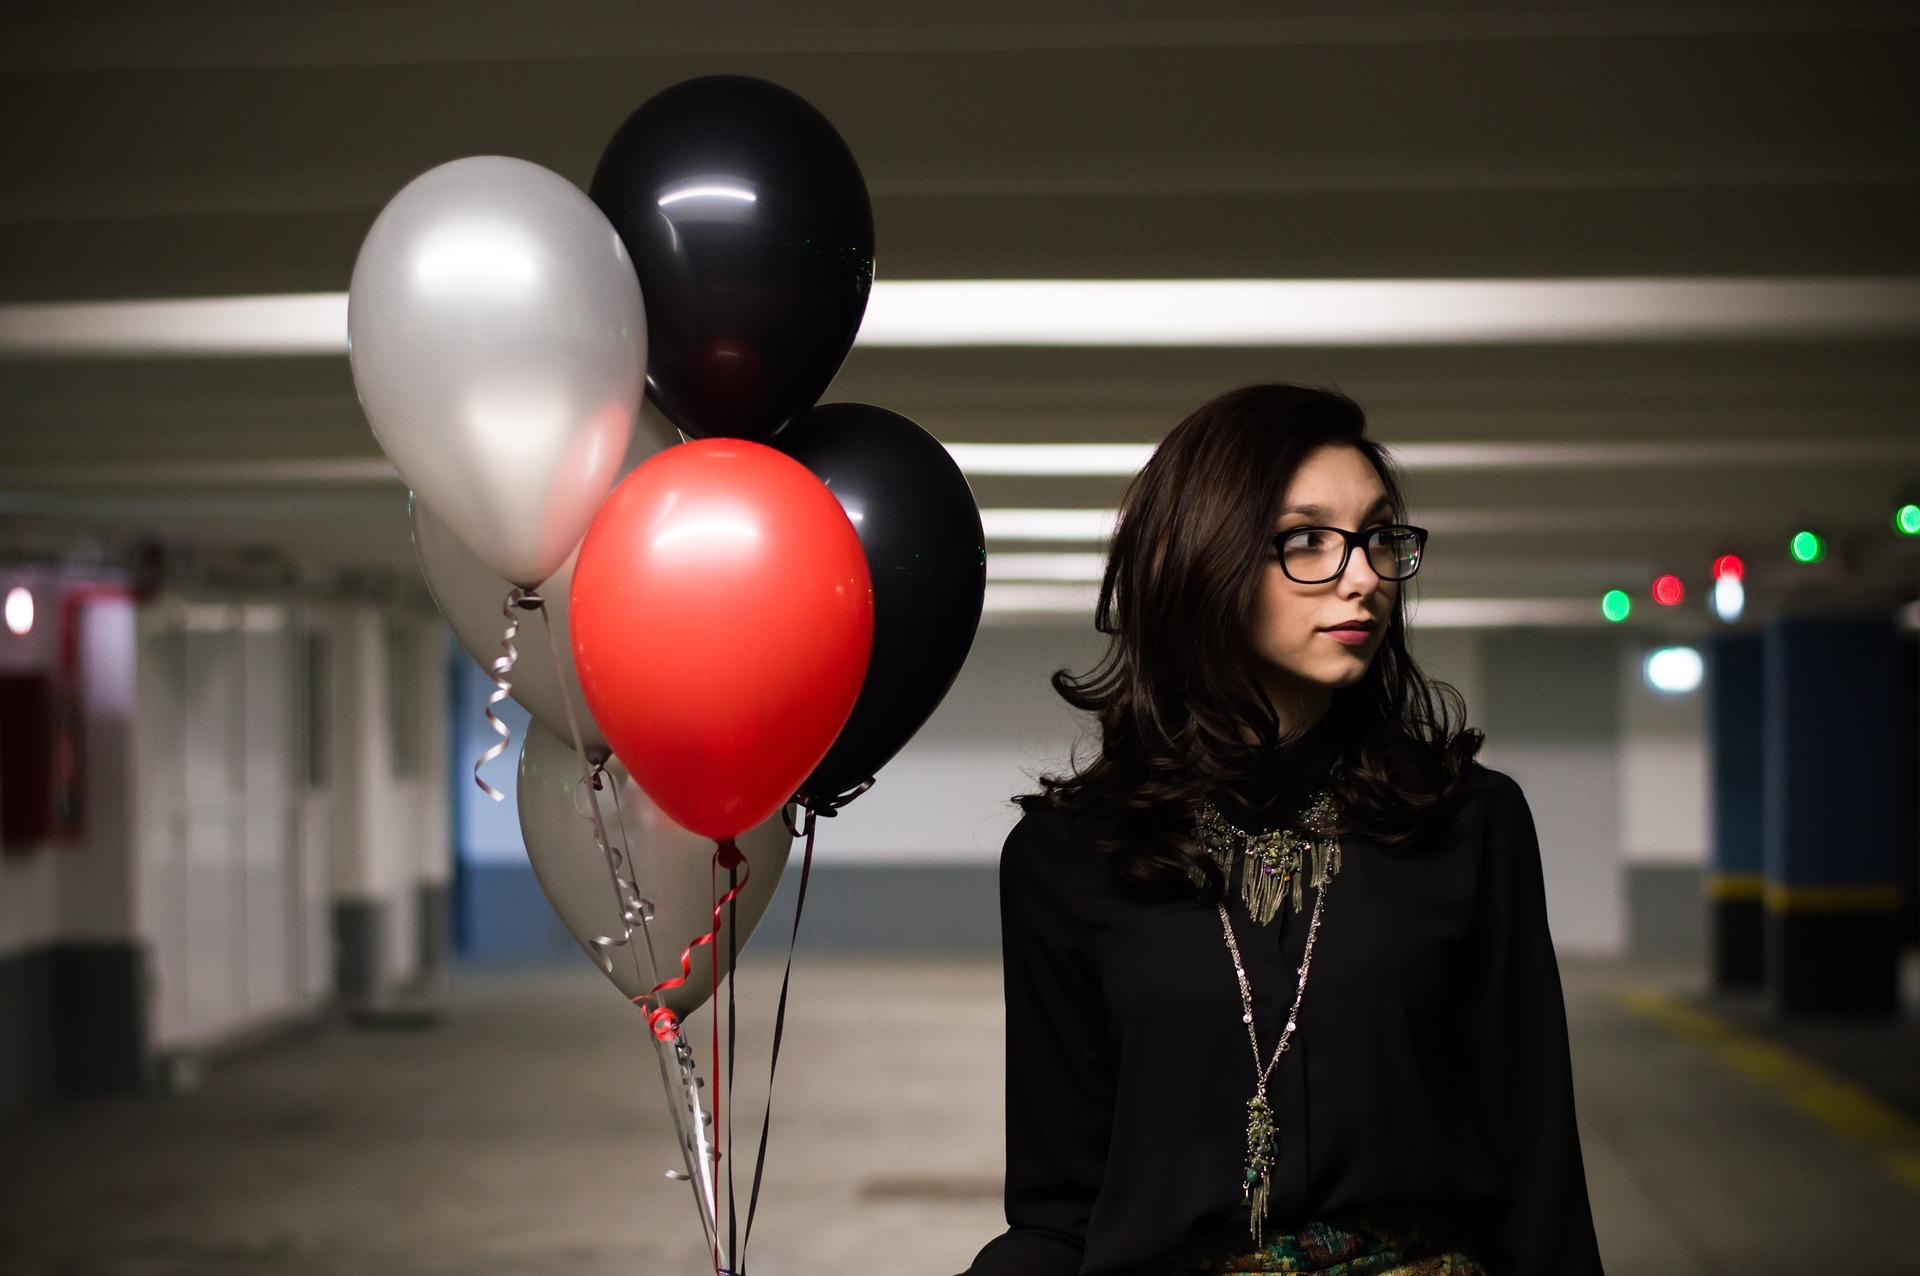 balloons-1331564_1920.jpg